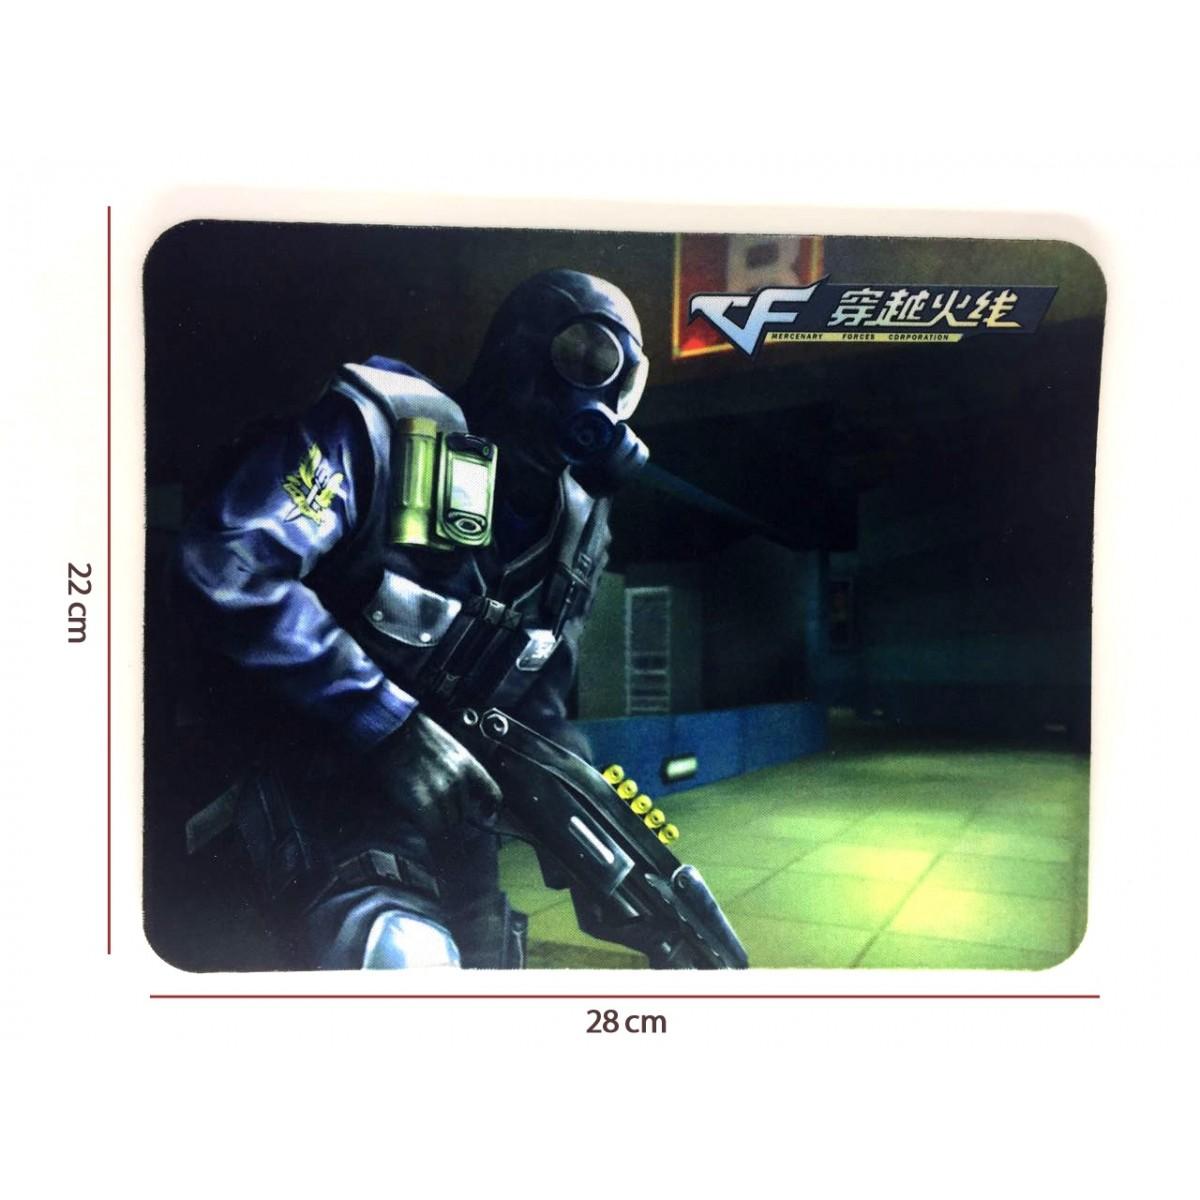 Mouse Pad Gamer Z6 28cmx22cm